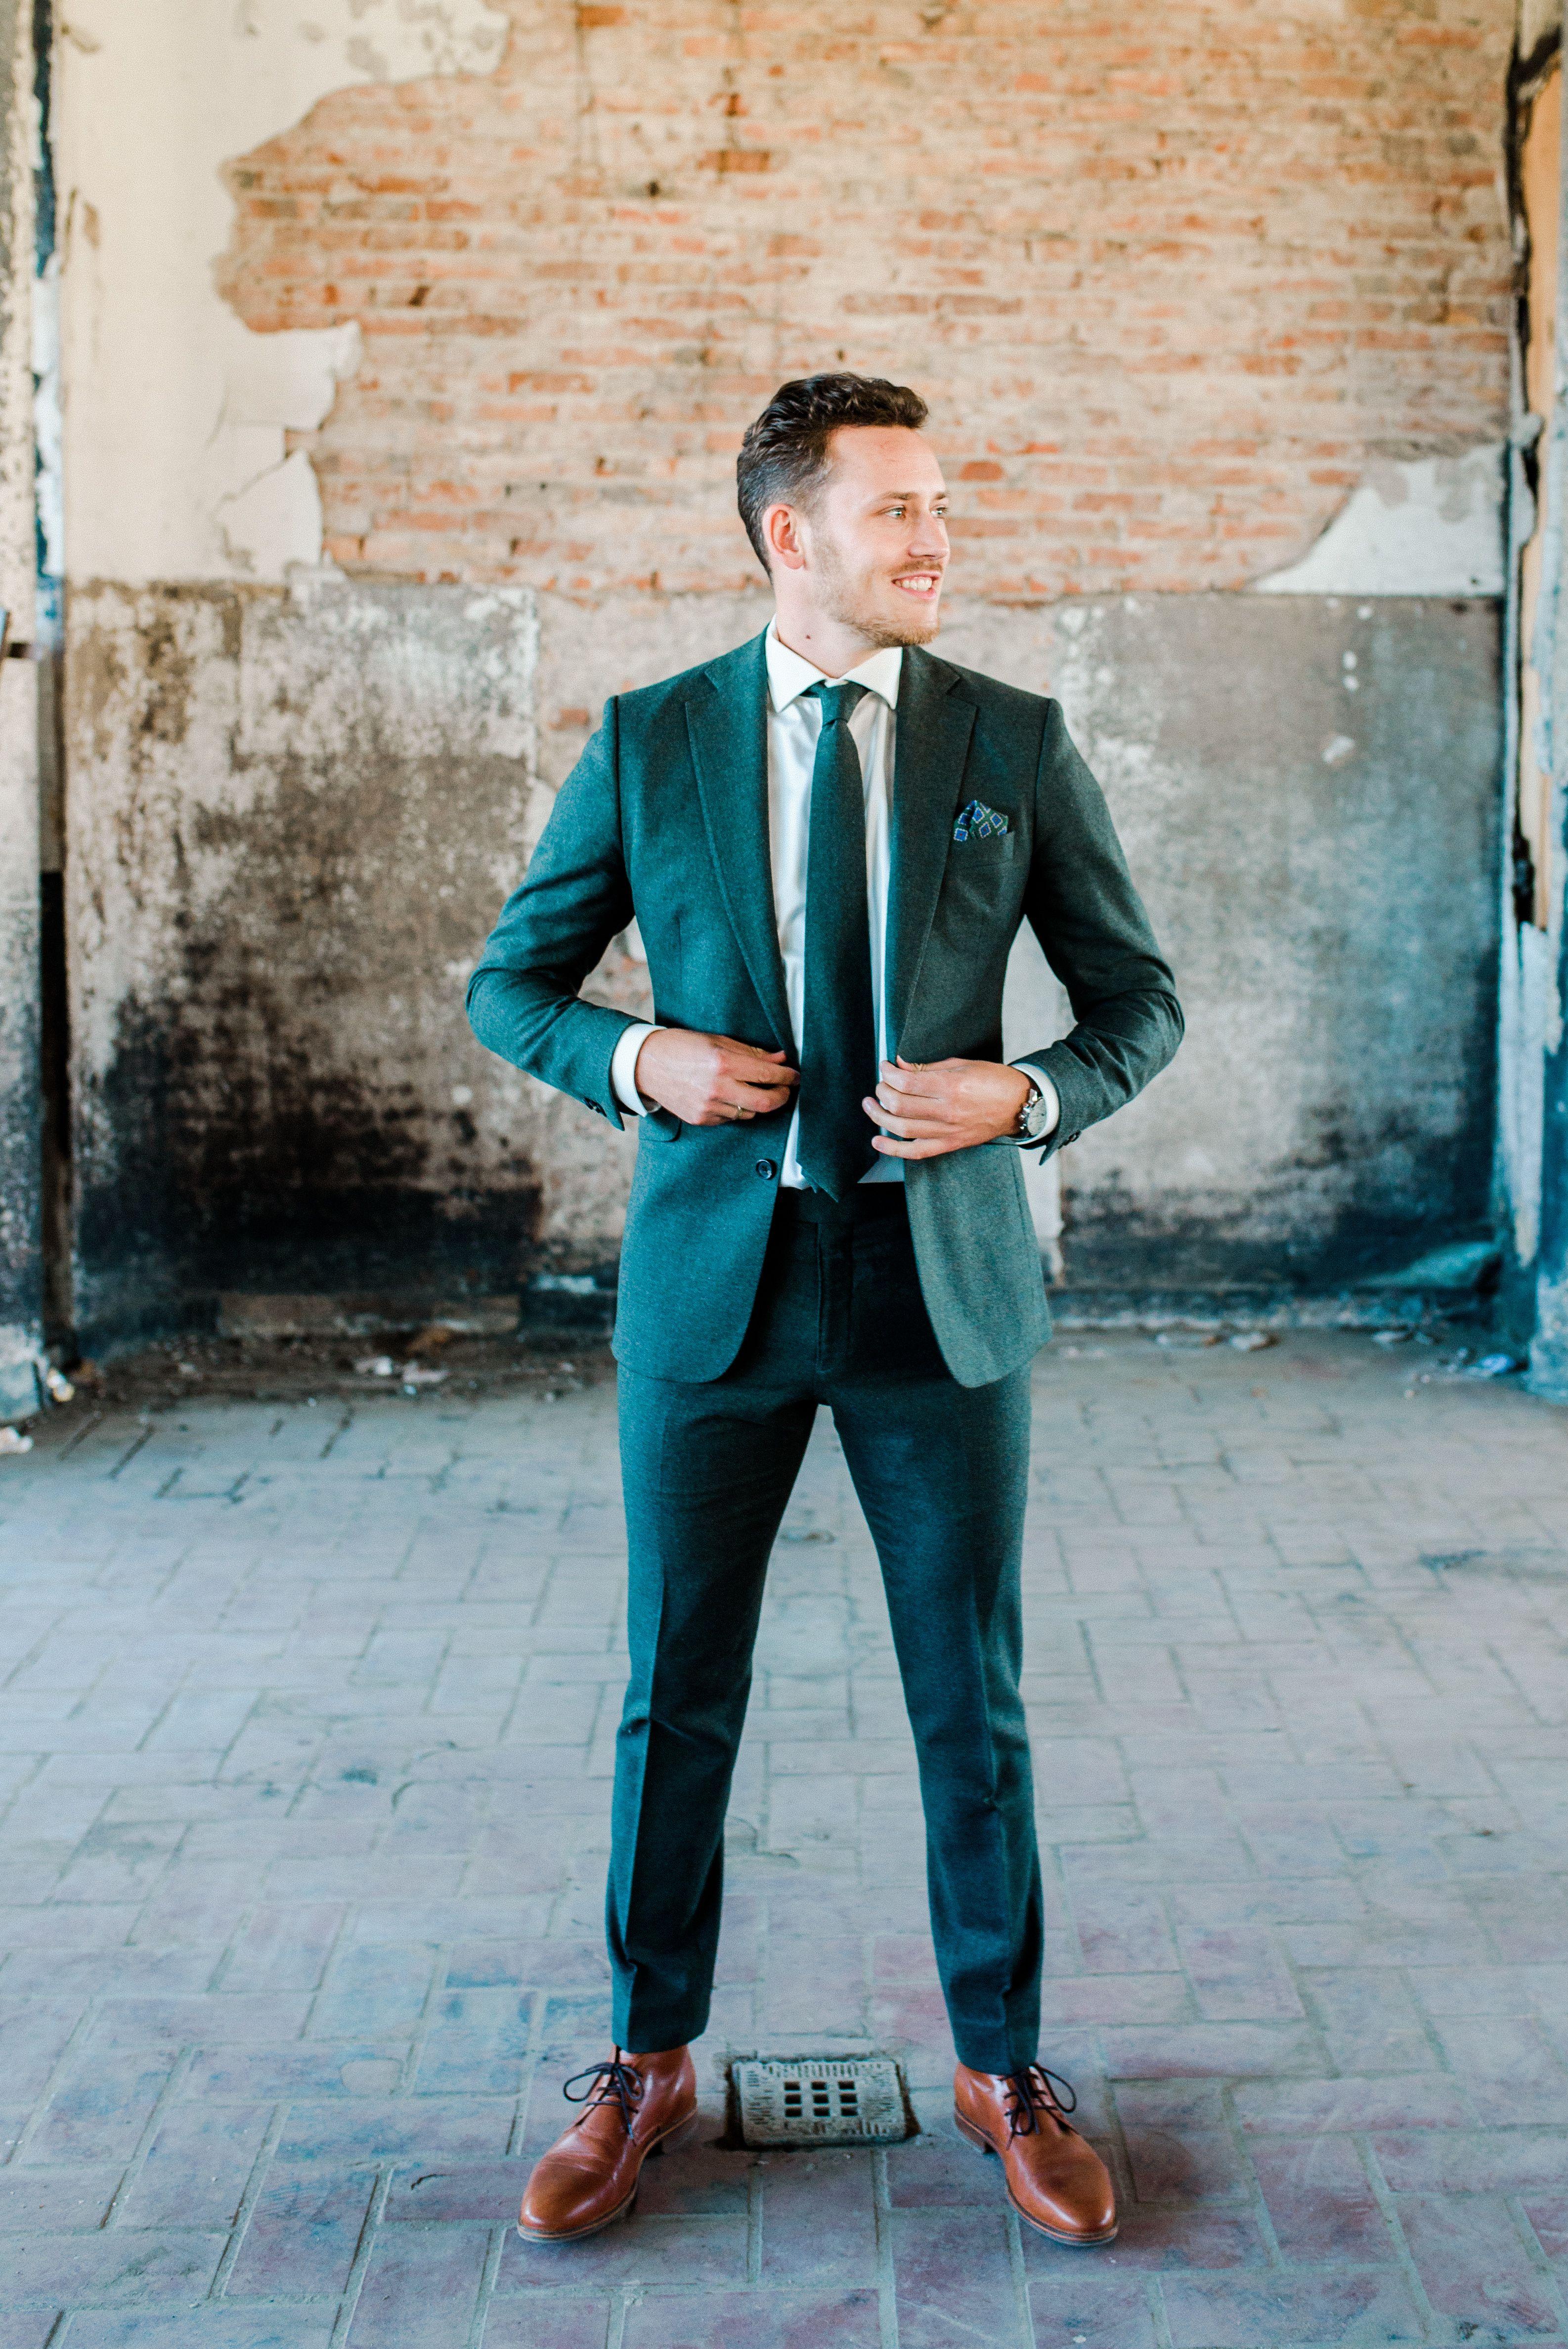 WEDDING SUIT: Green is the wedding trend this season. | Kostuum ...